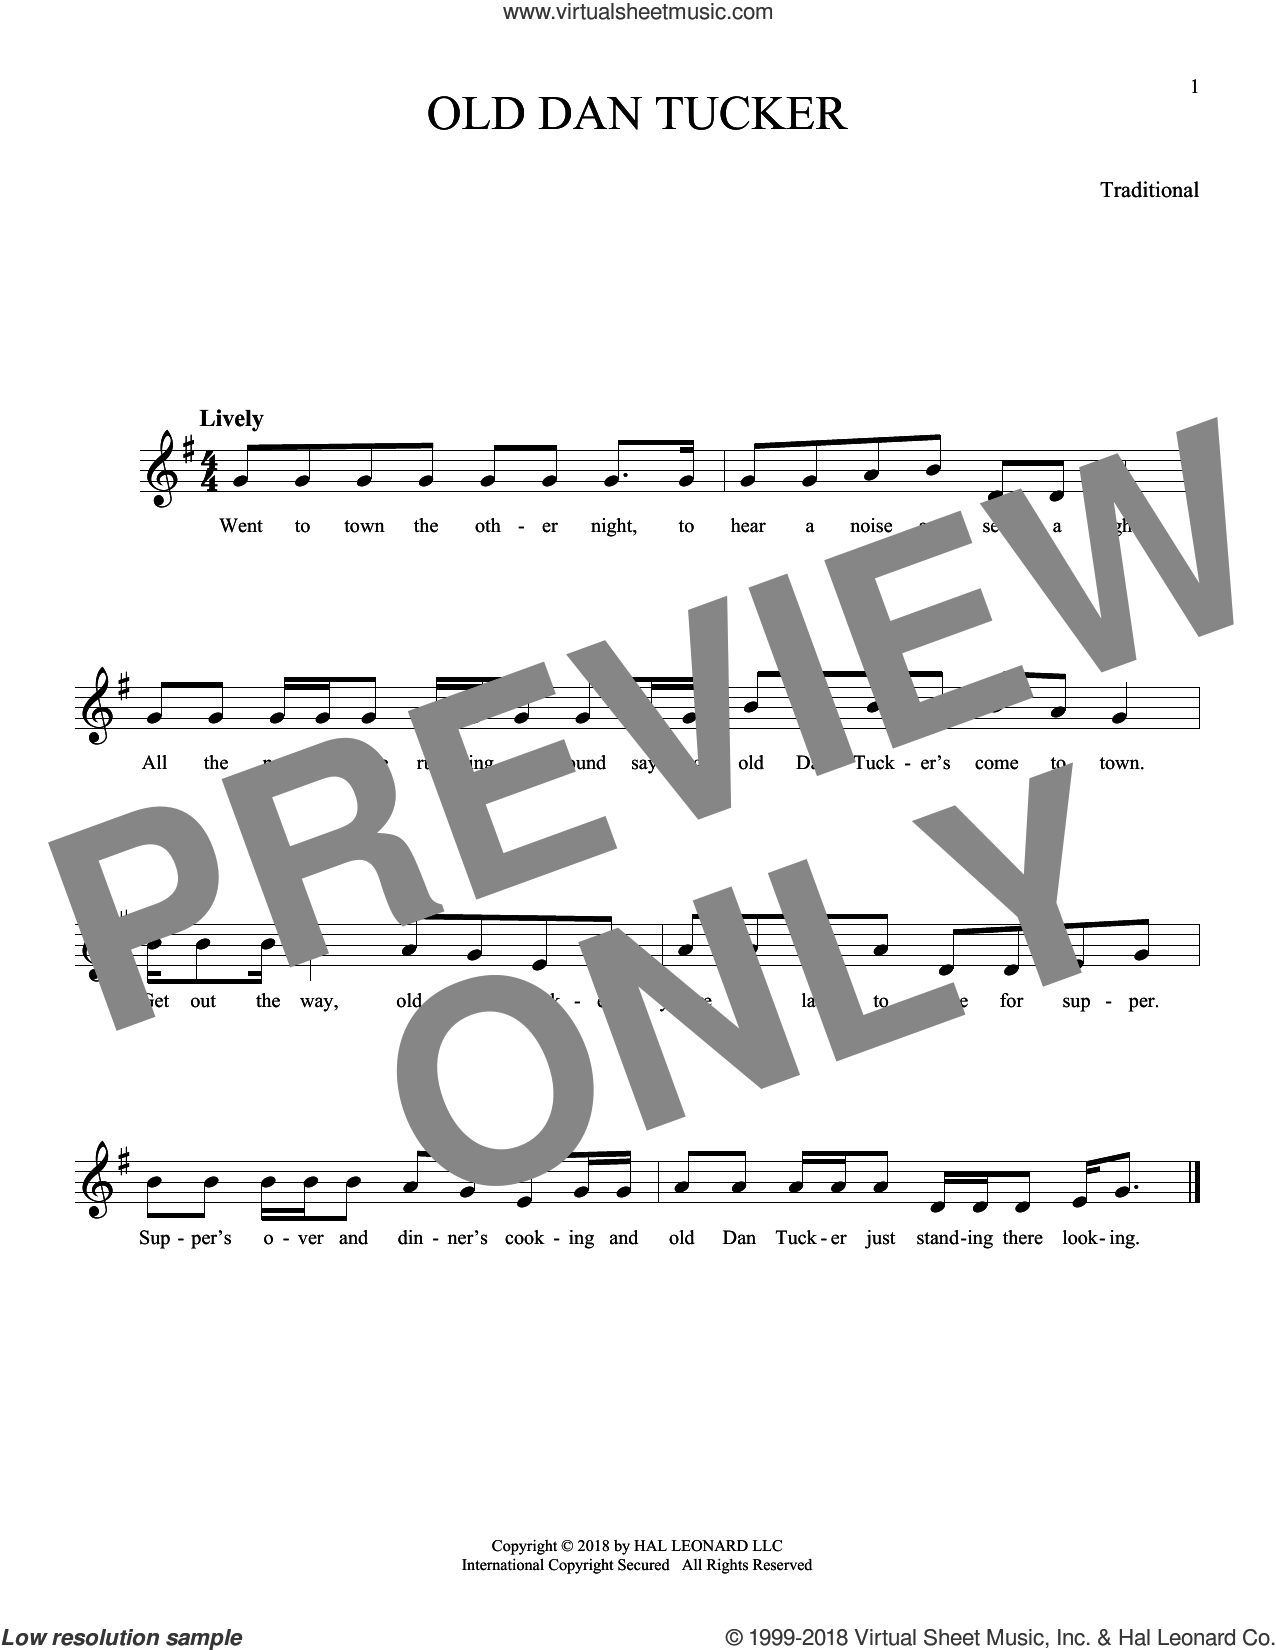 Old Dan Tucker sheet music for ocarina solo, intermediate skill level